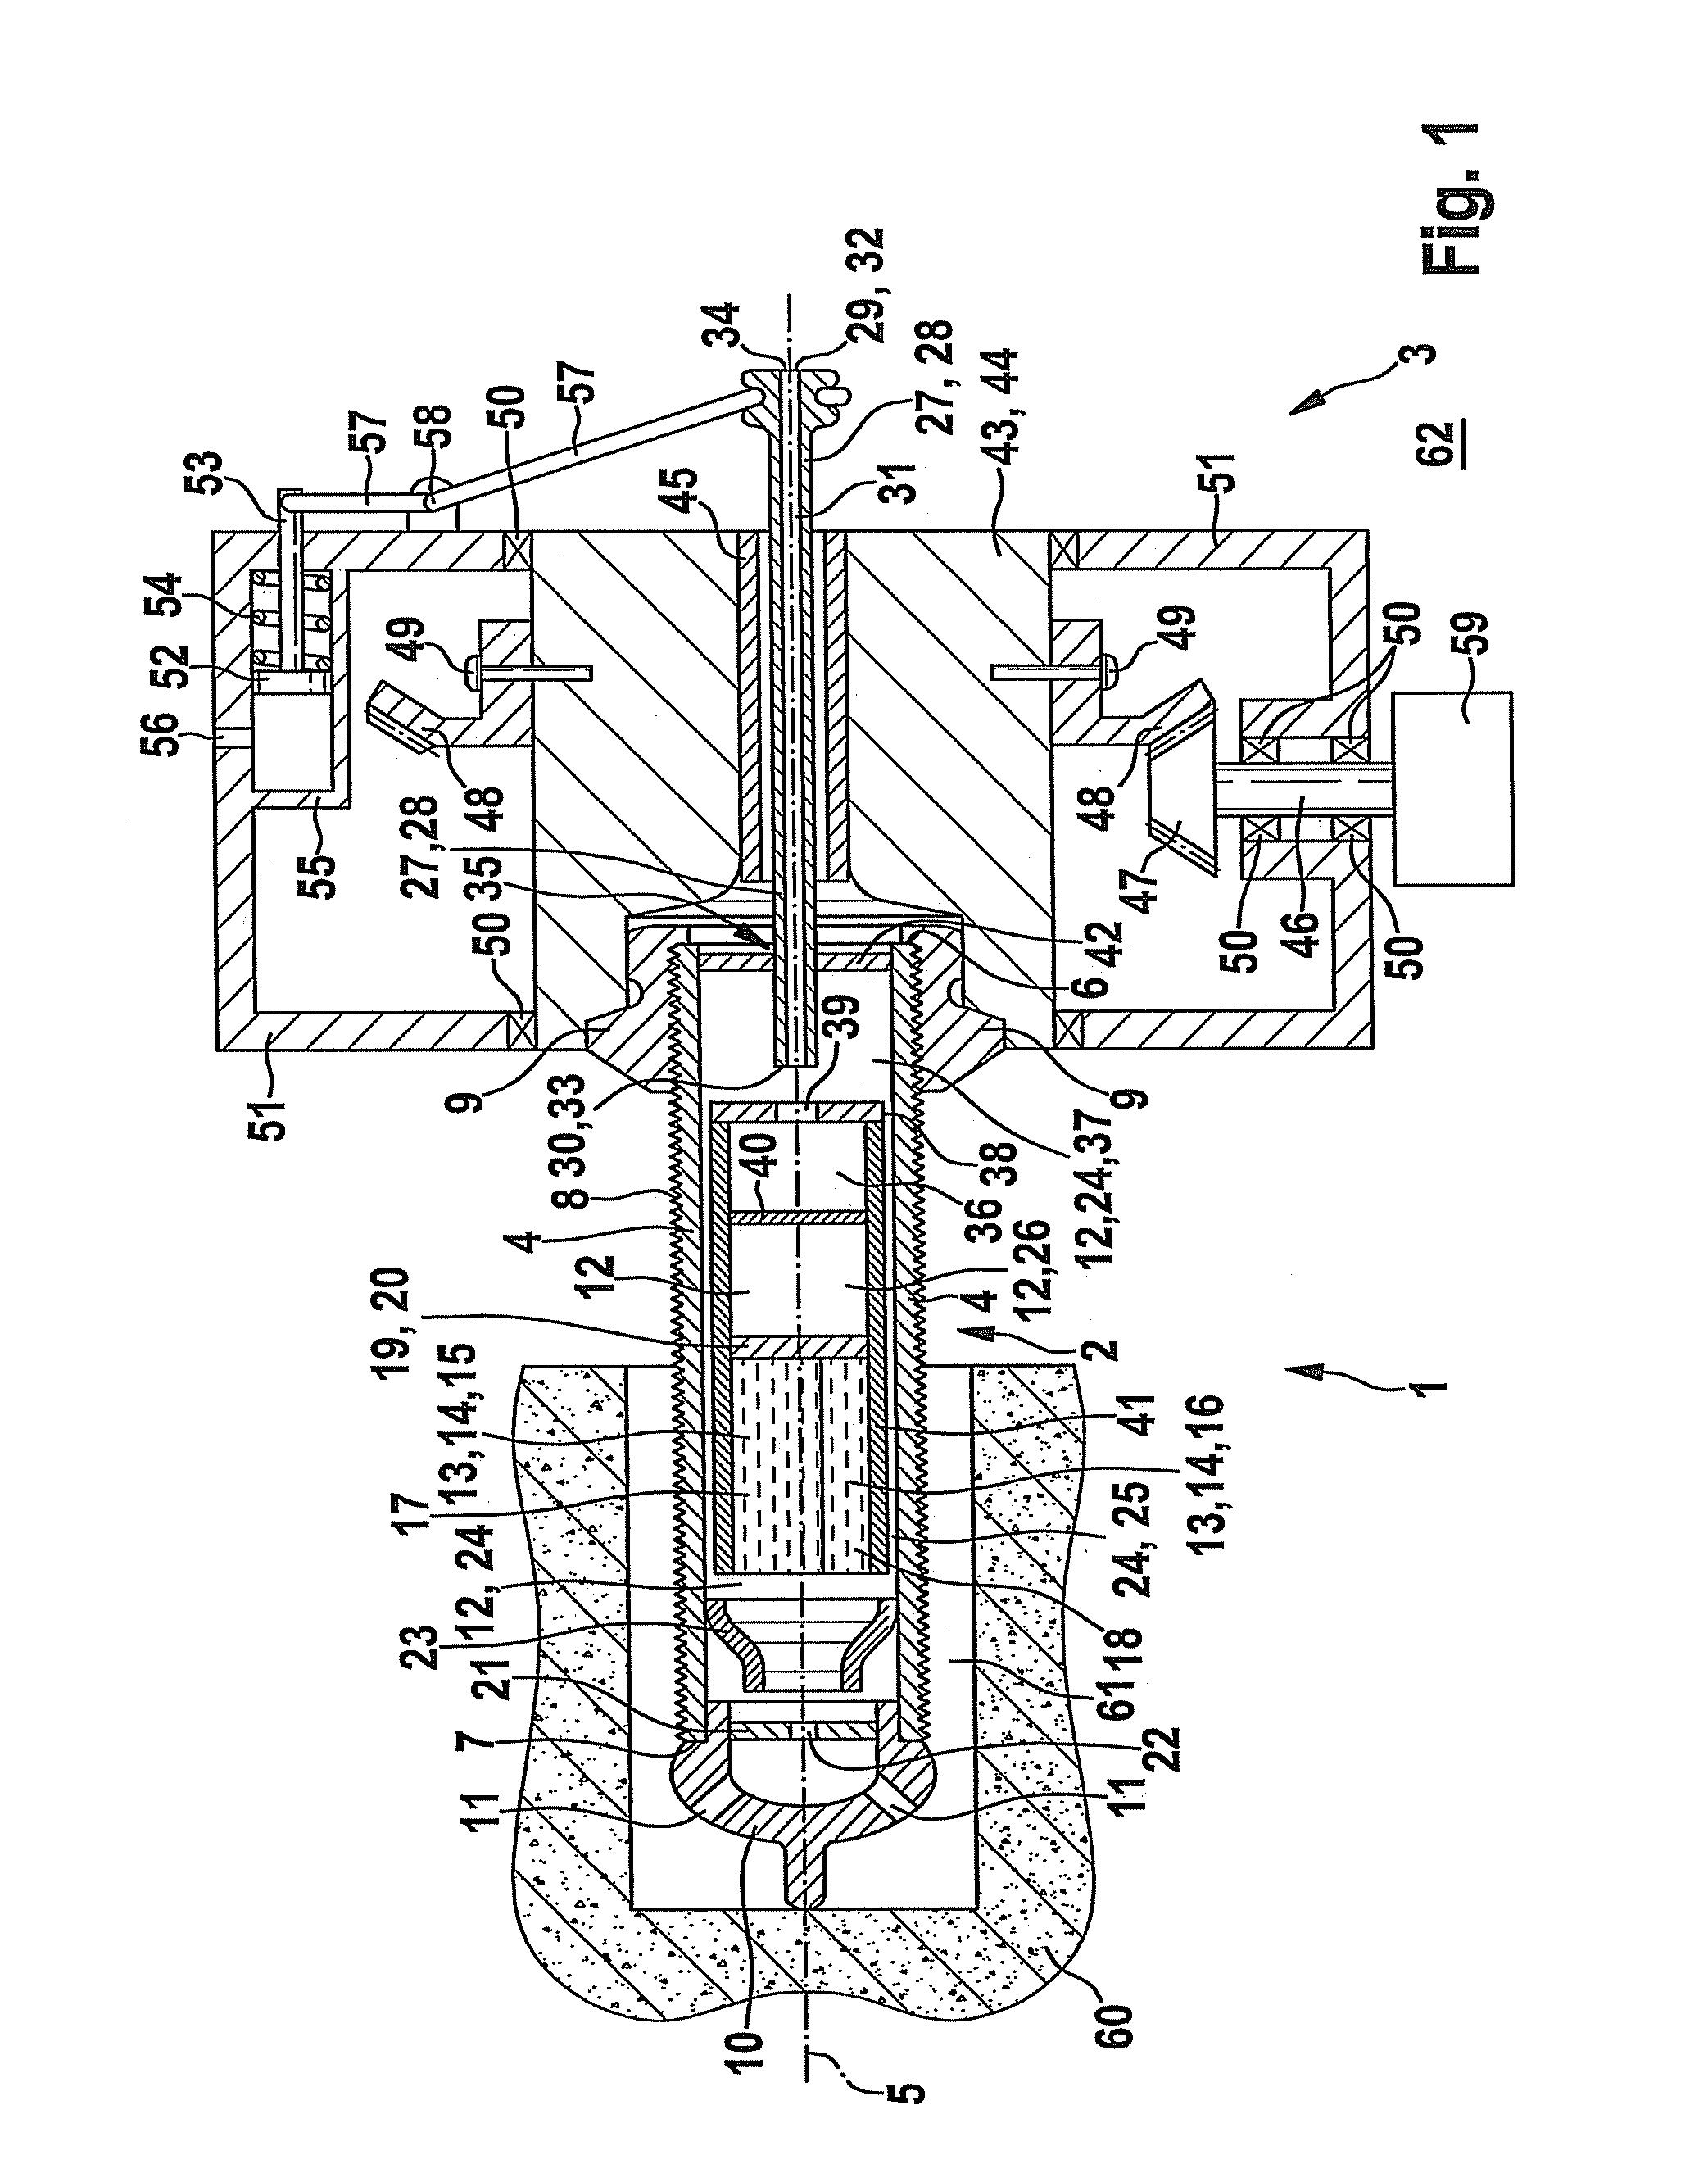 Kubota M4700 Wiring Diagram Best Secret Electrical Diagrams Free Rtv900 Front Axle M9540 M4700dt